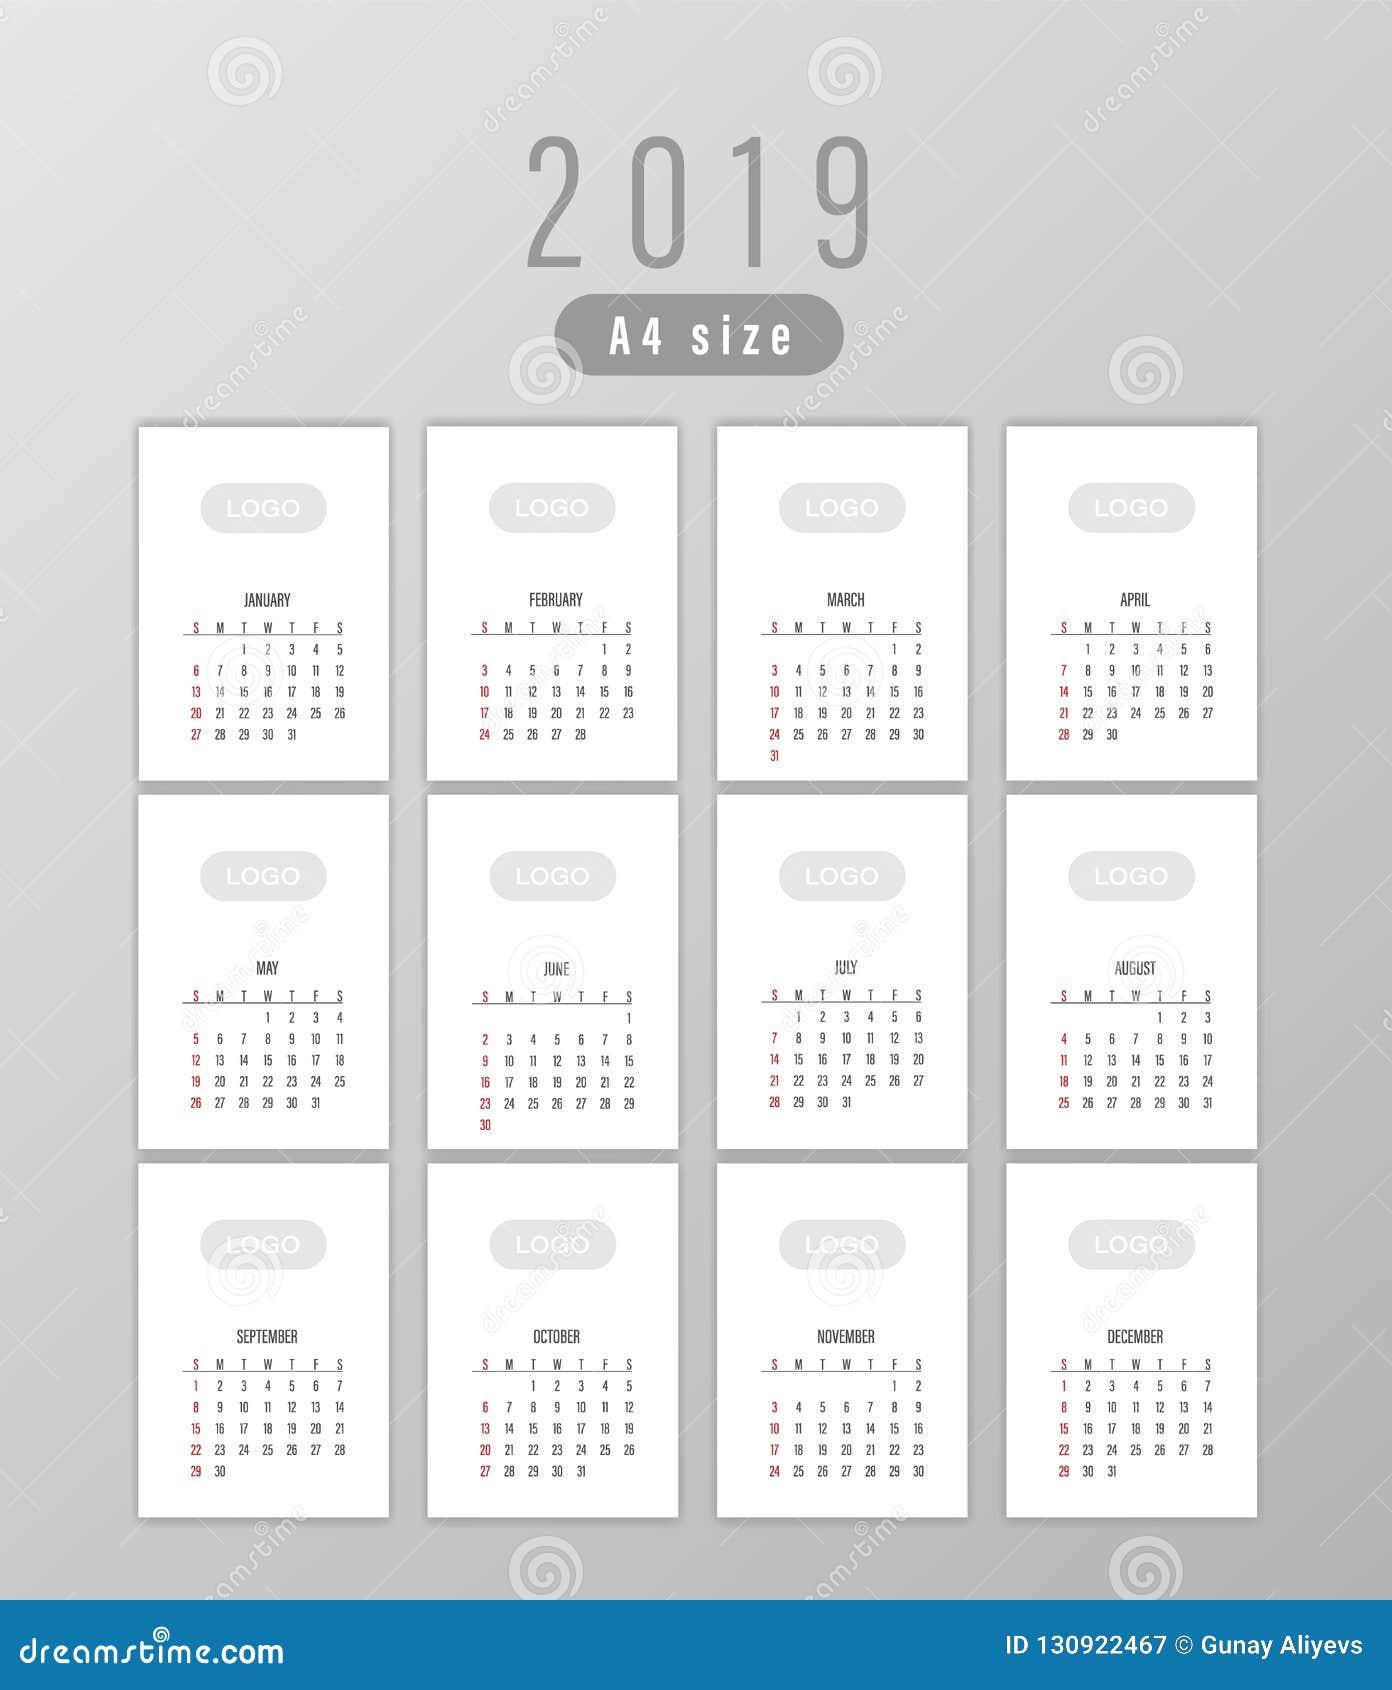 Calendrier Impression.Impression Du Calendrier Pour 2019 Illustration Stock